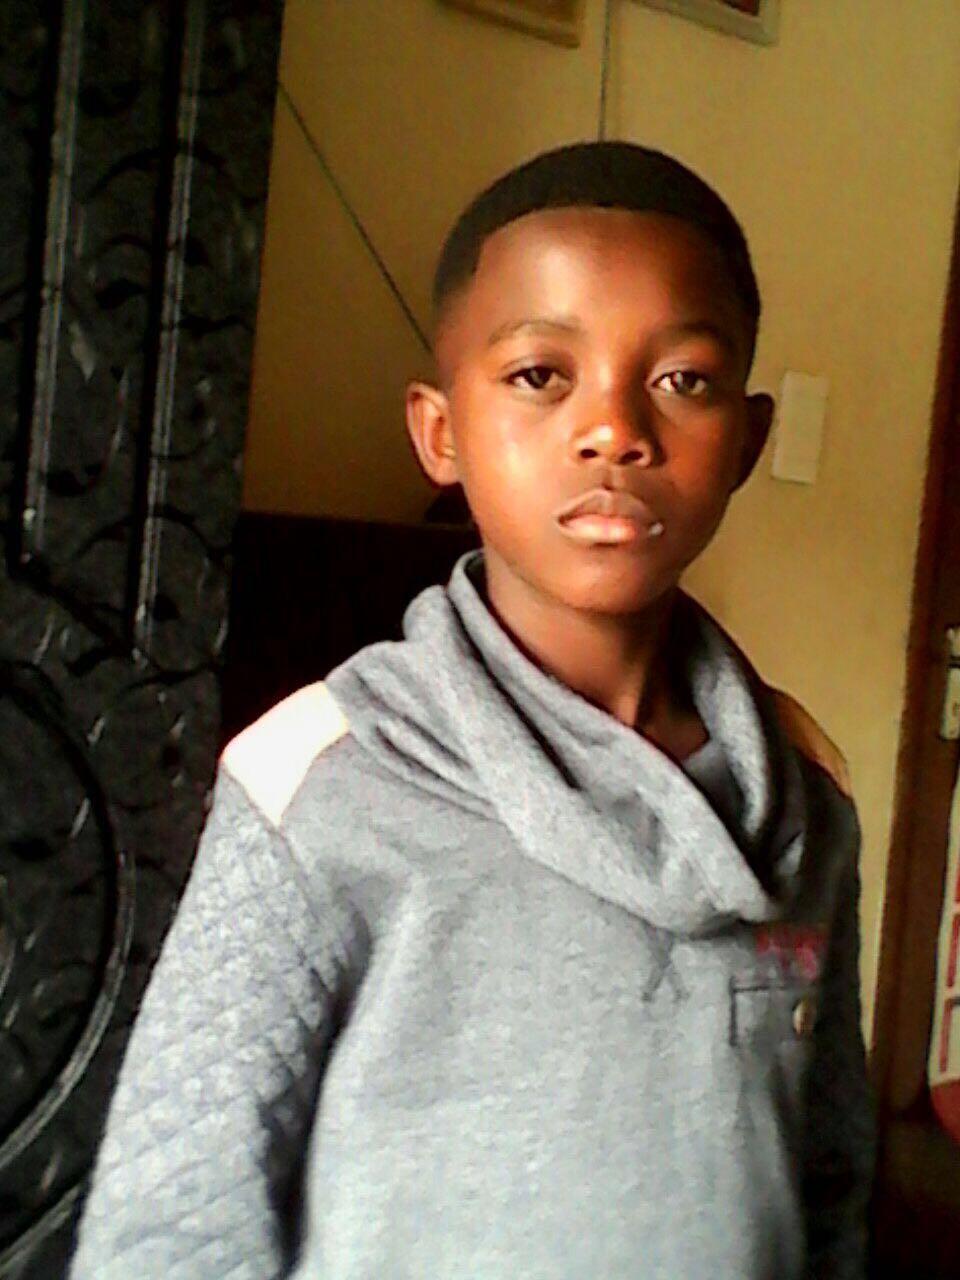 Missing Child:  Durban